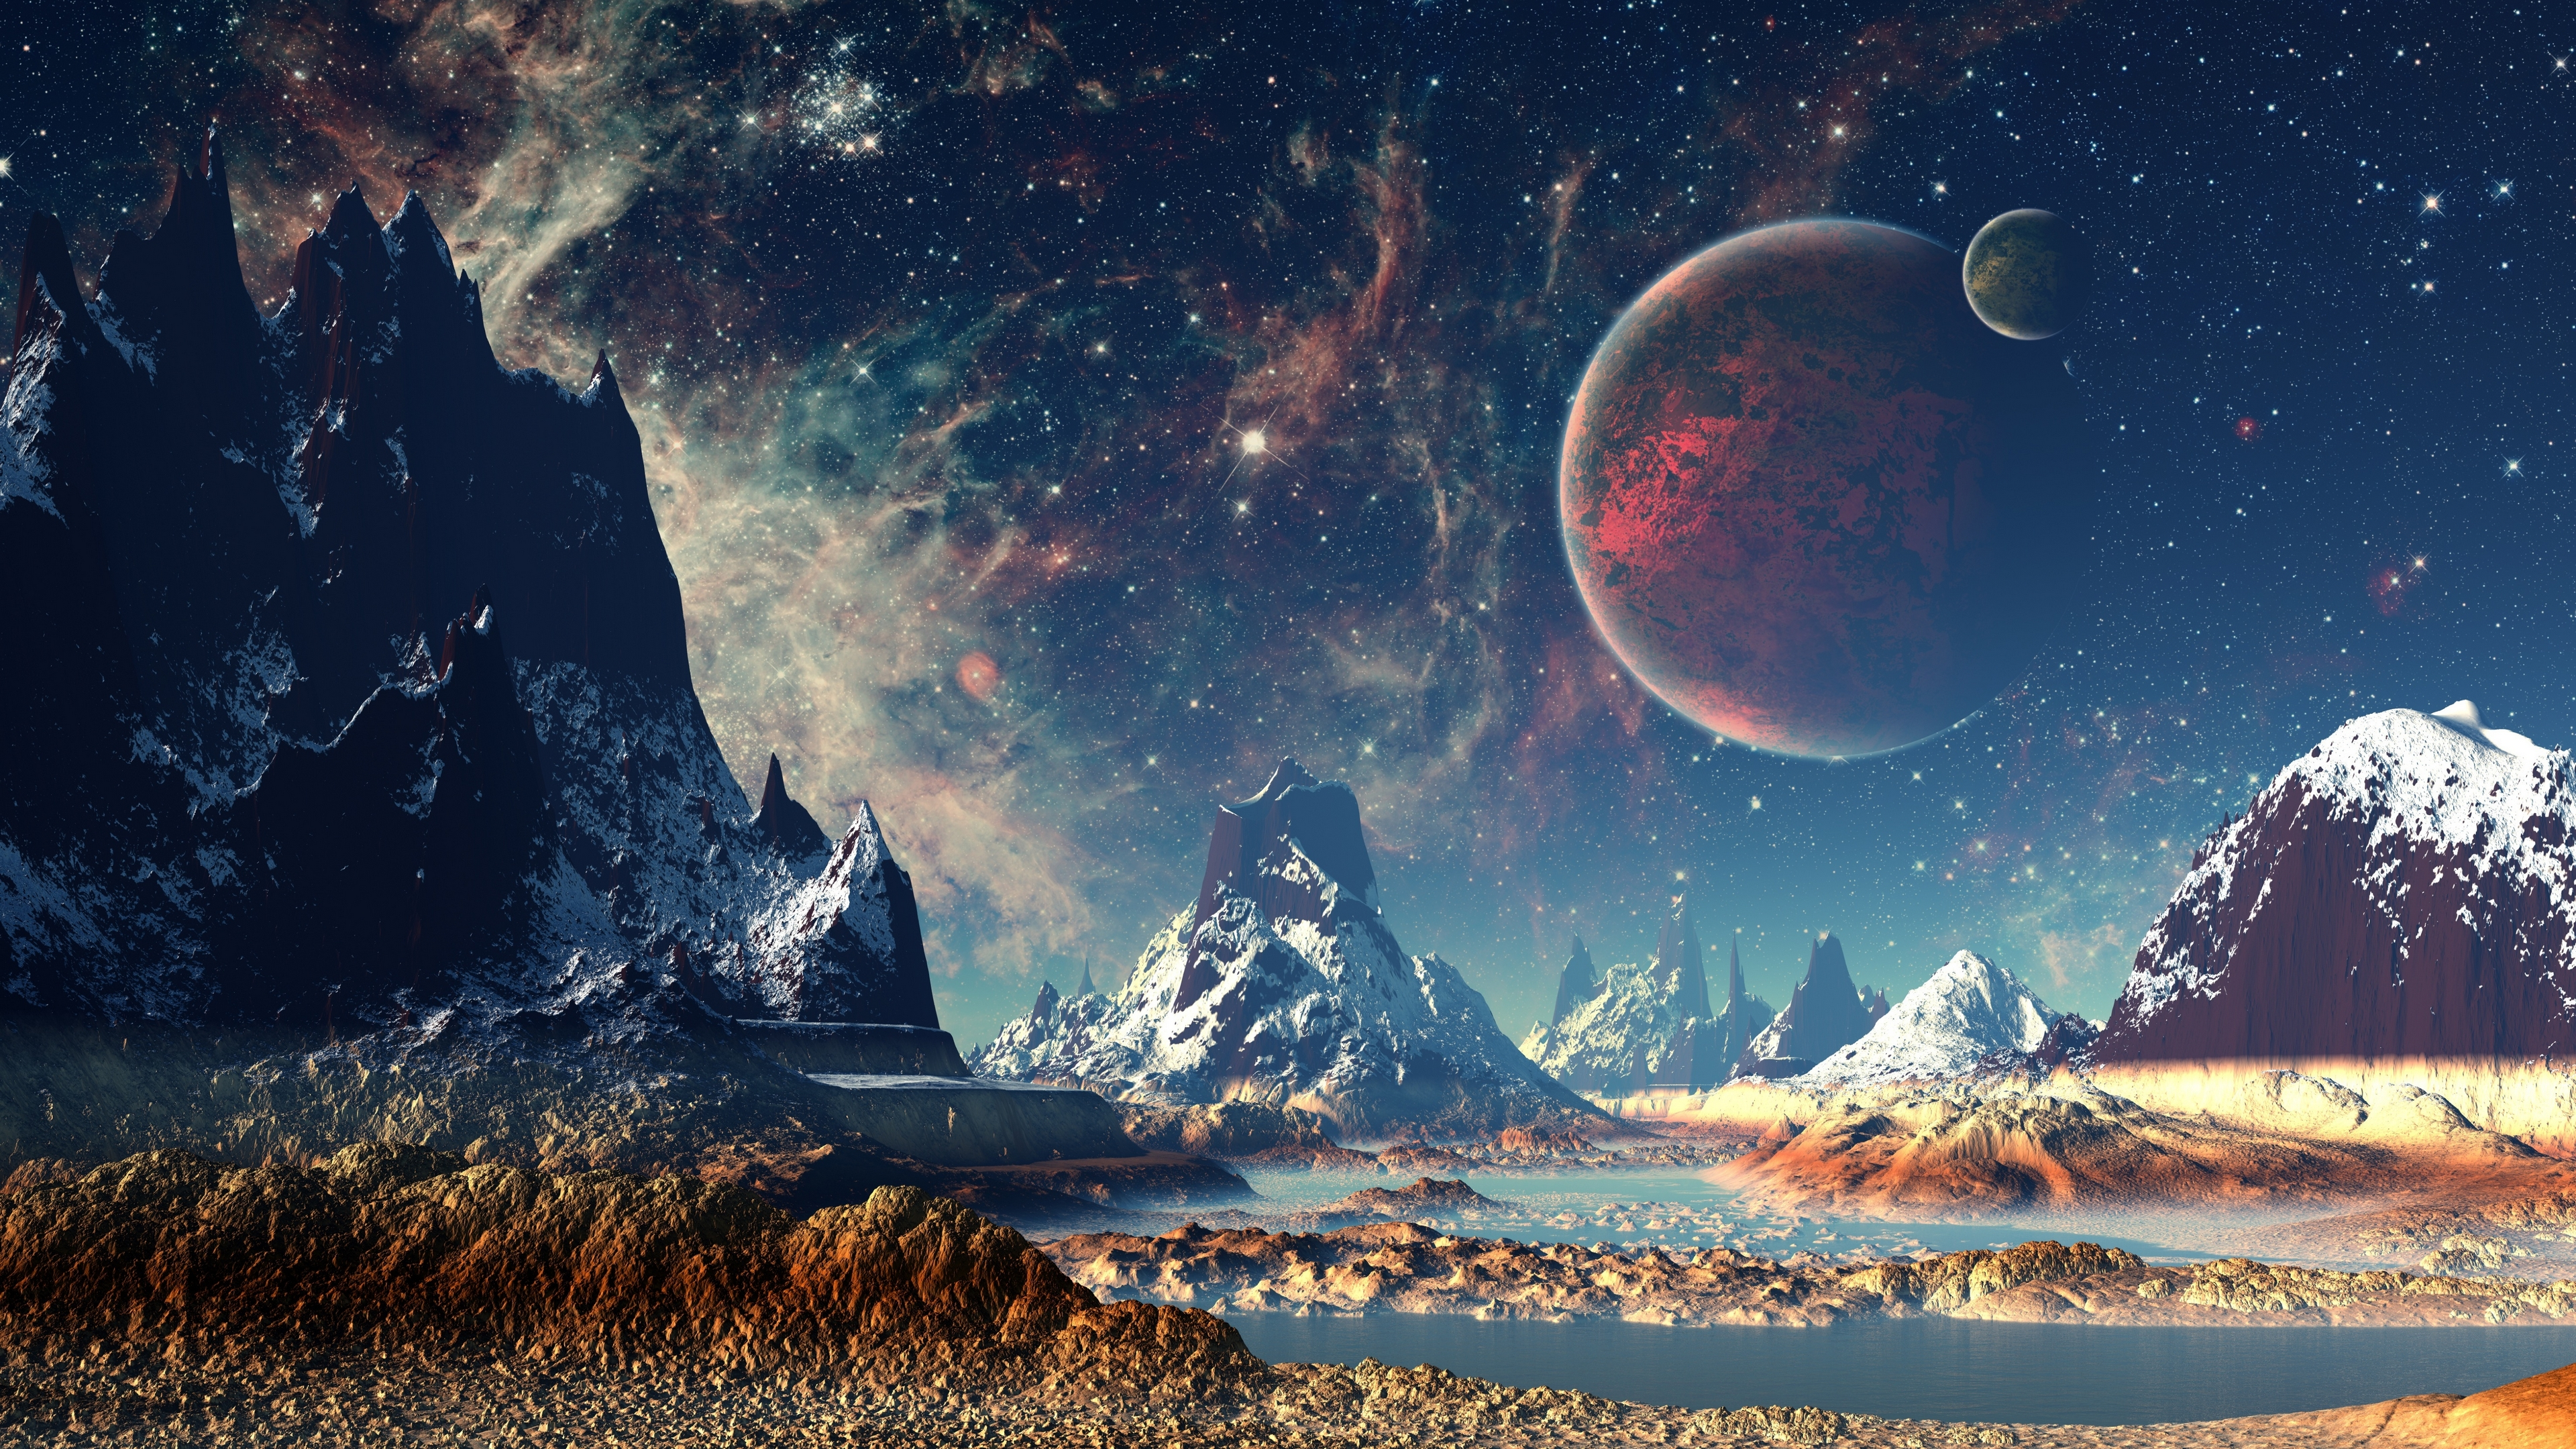 Wallpapers del universo[4k] - Imágenes en Taringa!